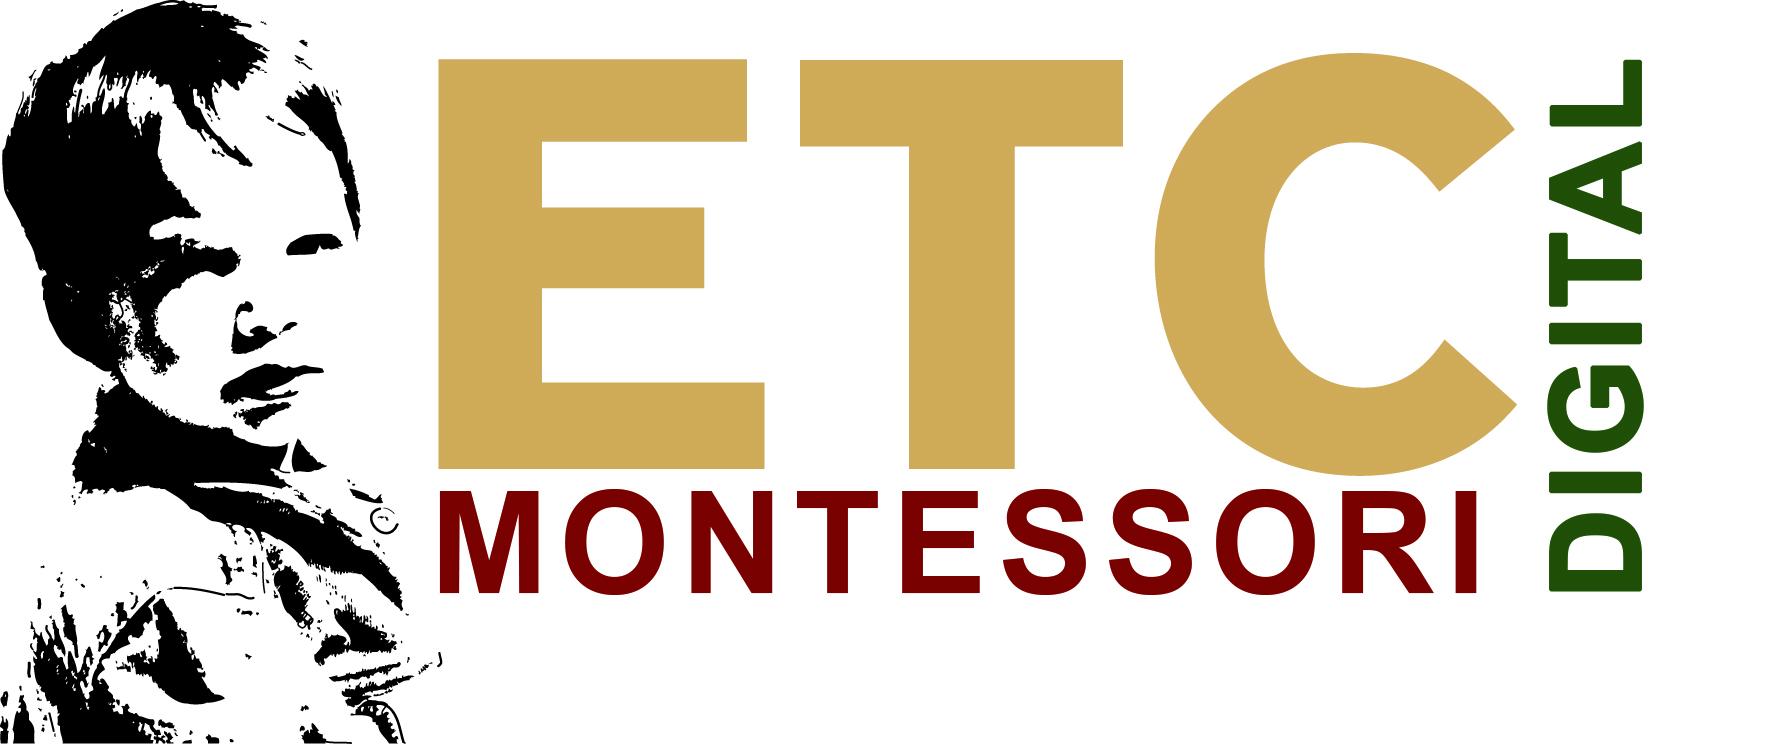 etc-montessori-digital-logo.jpg